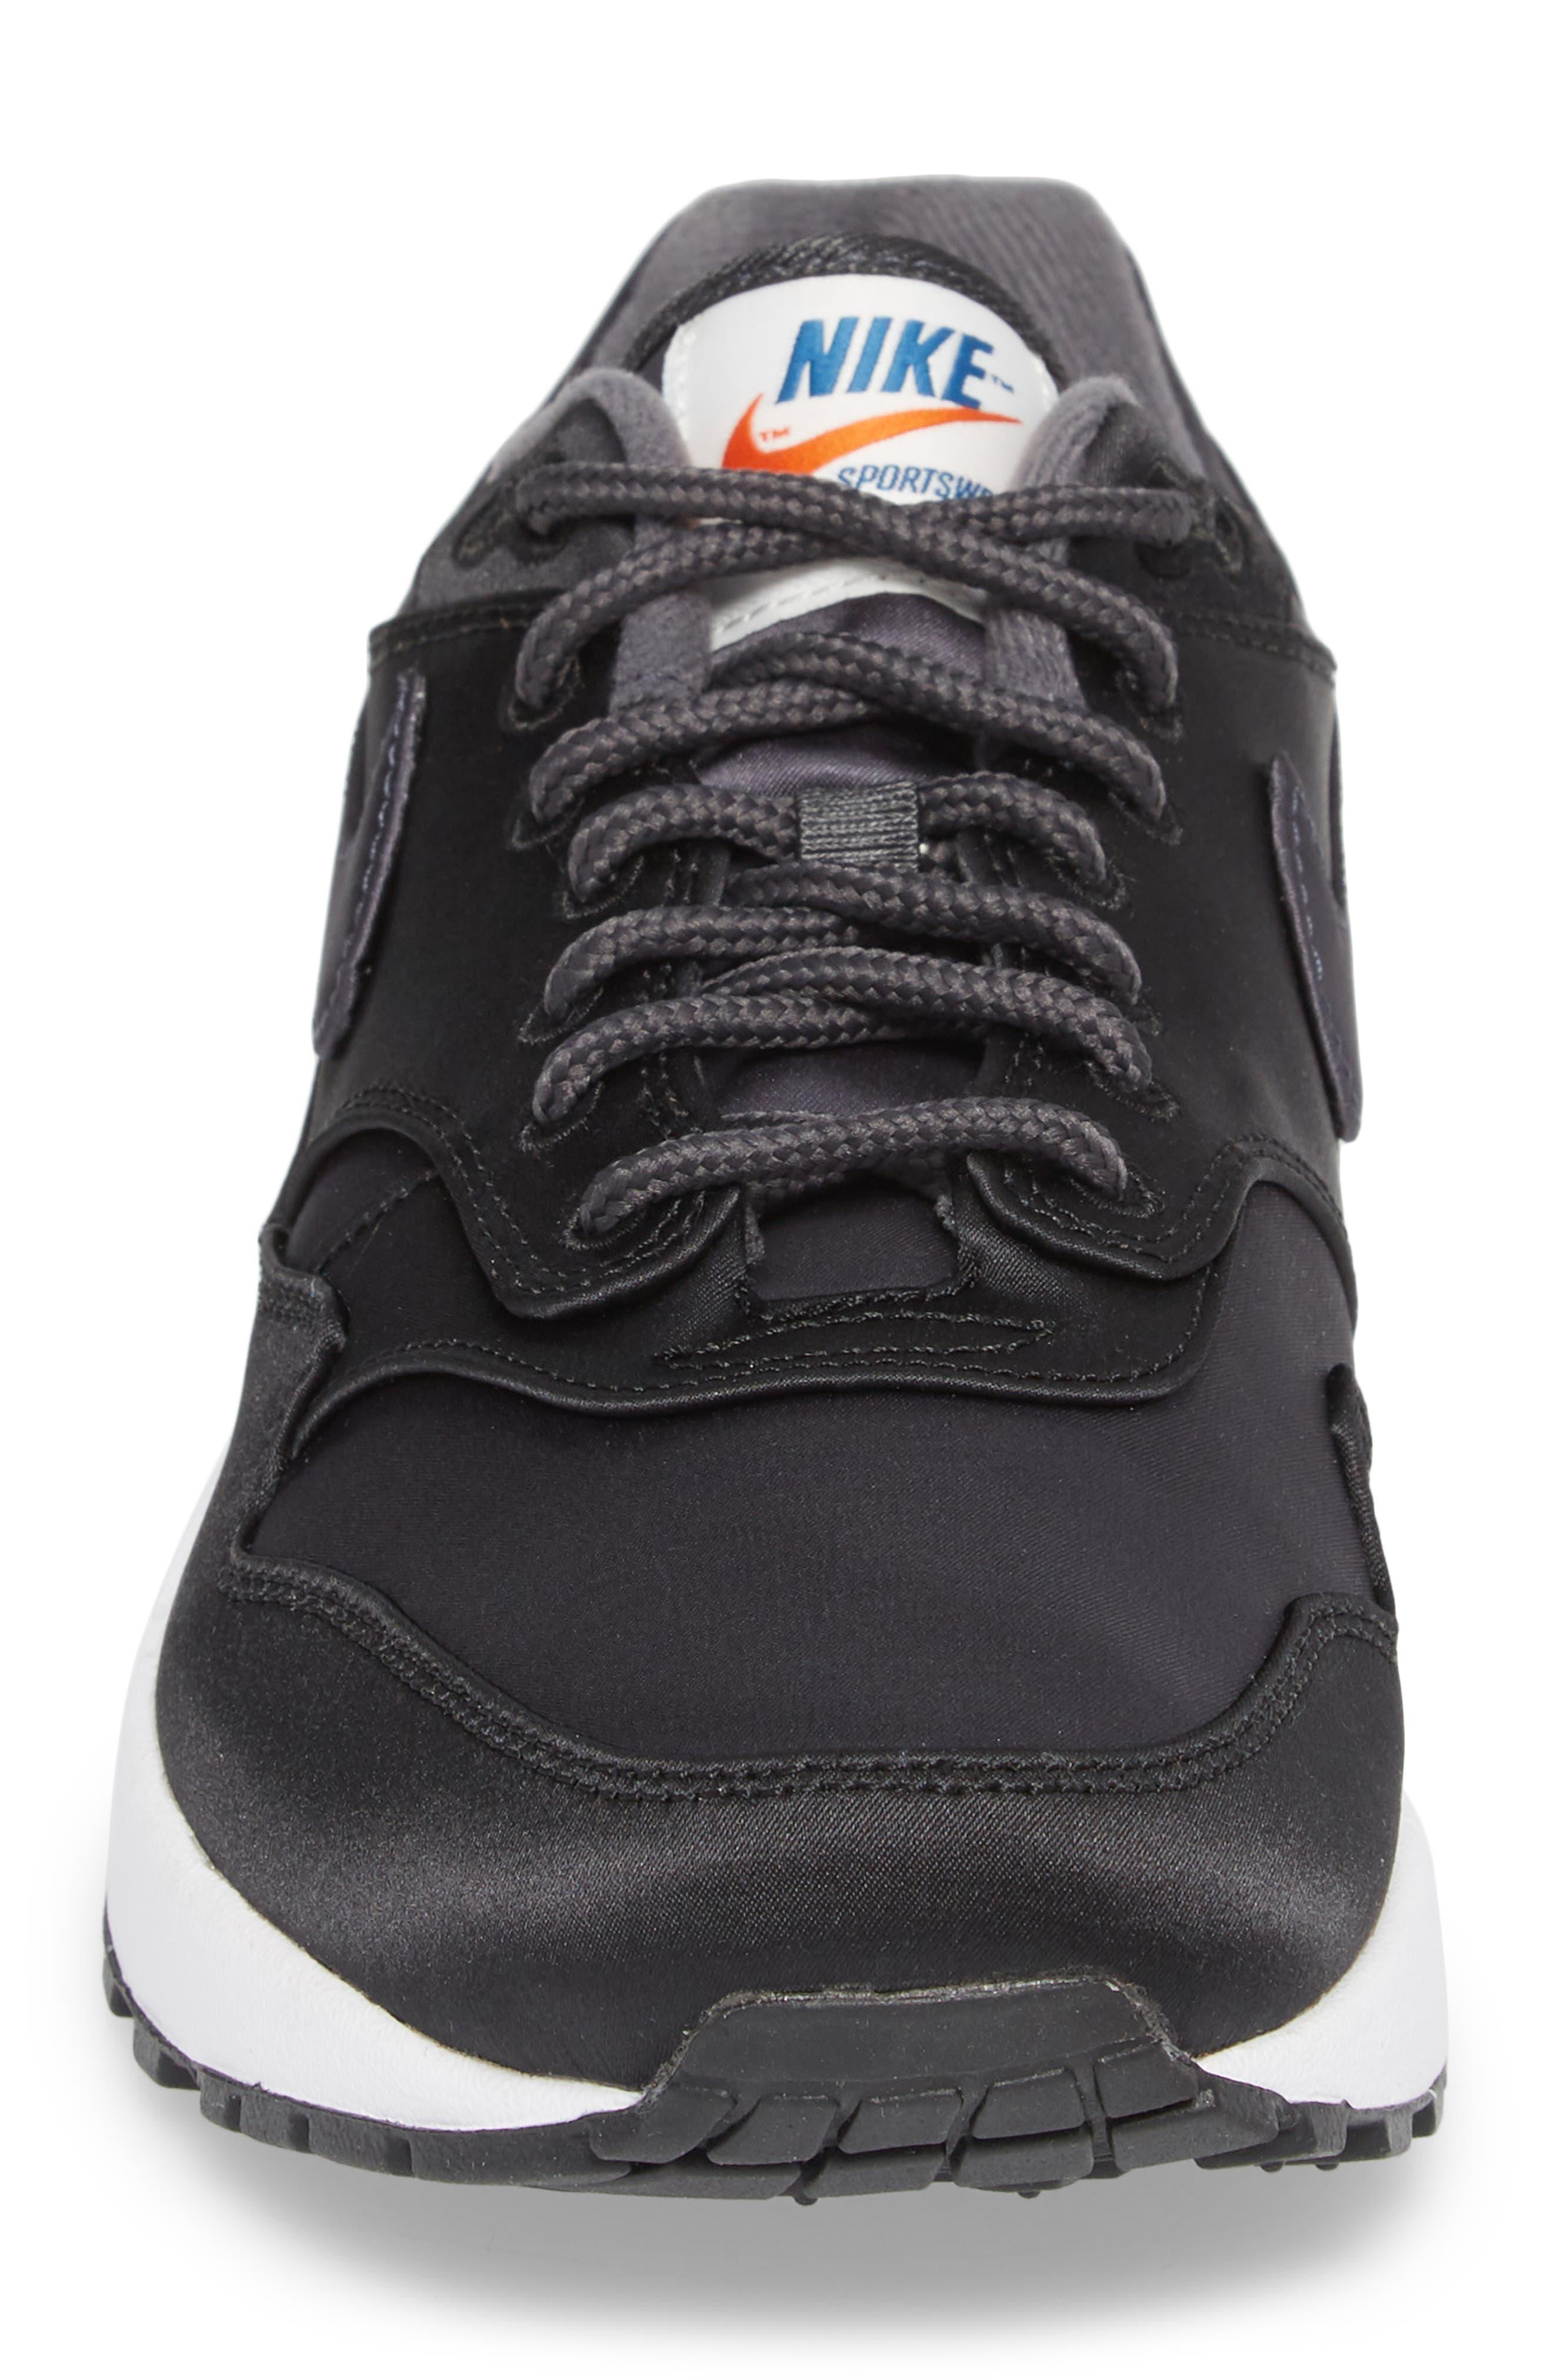 Air Max 1 SE Sneaker,                             Alternate thumbnail 4, color,                             Black/ Anthracite/ White